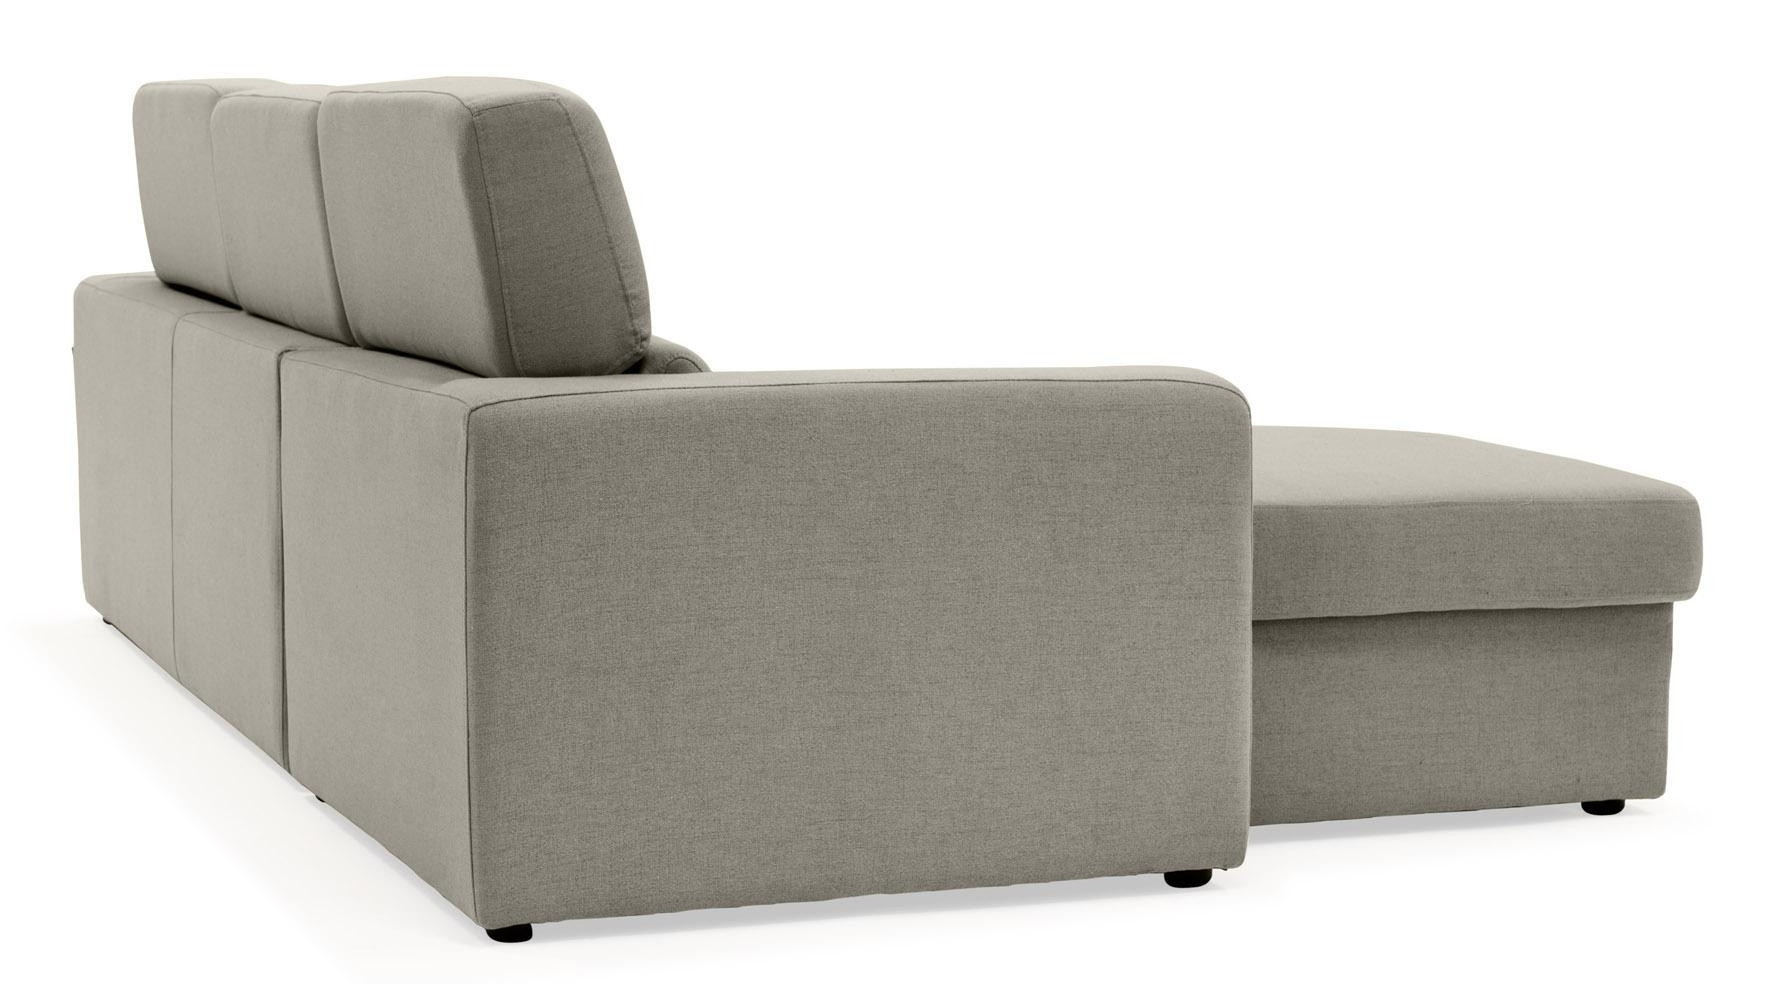 Gray Clubber Sleeper Sectional Sofa | Zuri Furniture In Sleeper Sectional Sofas (View 17 of 20)